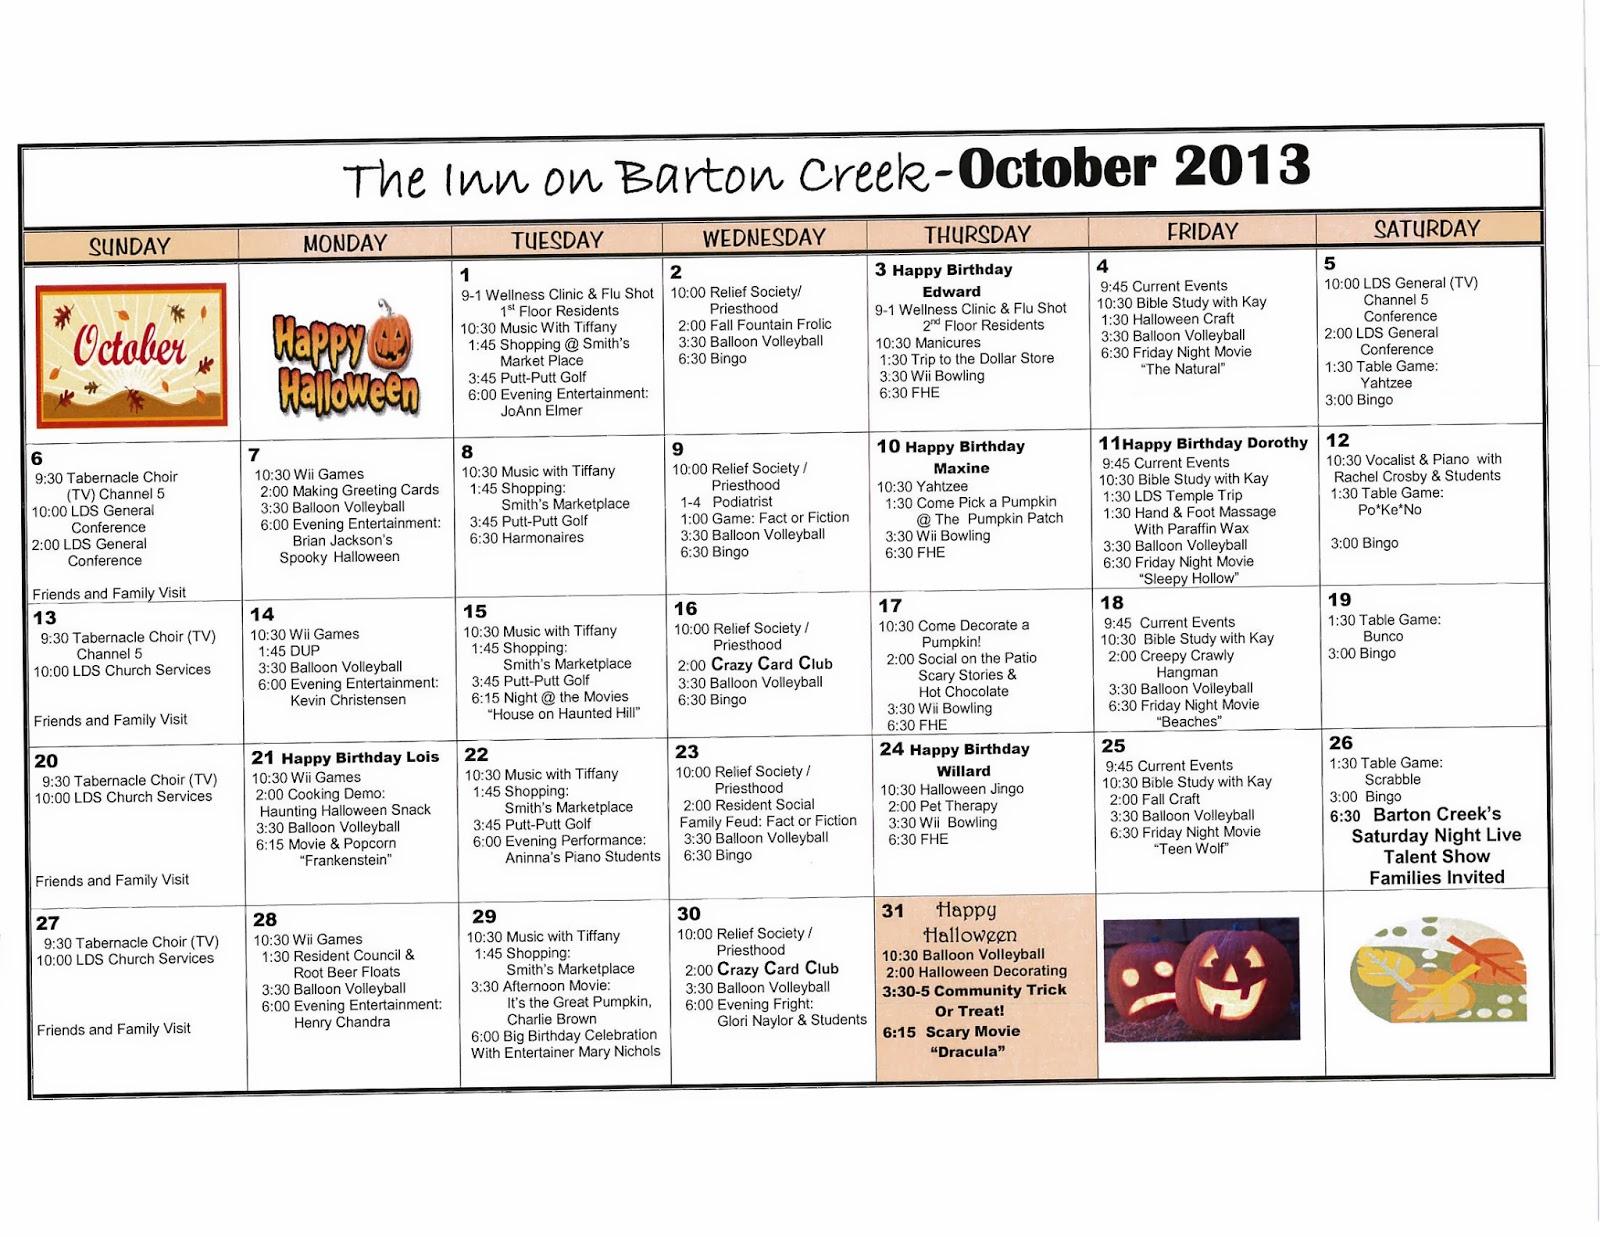 Calendar Ideas For Nursing Homes : Barton creek assisted living october activities calendar